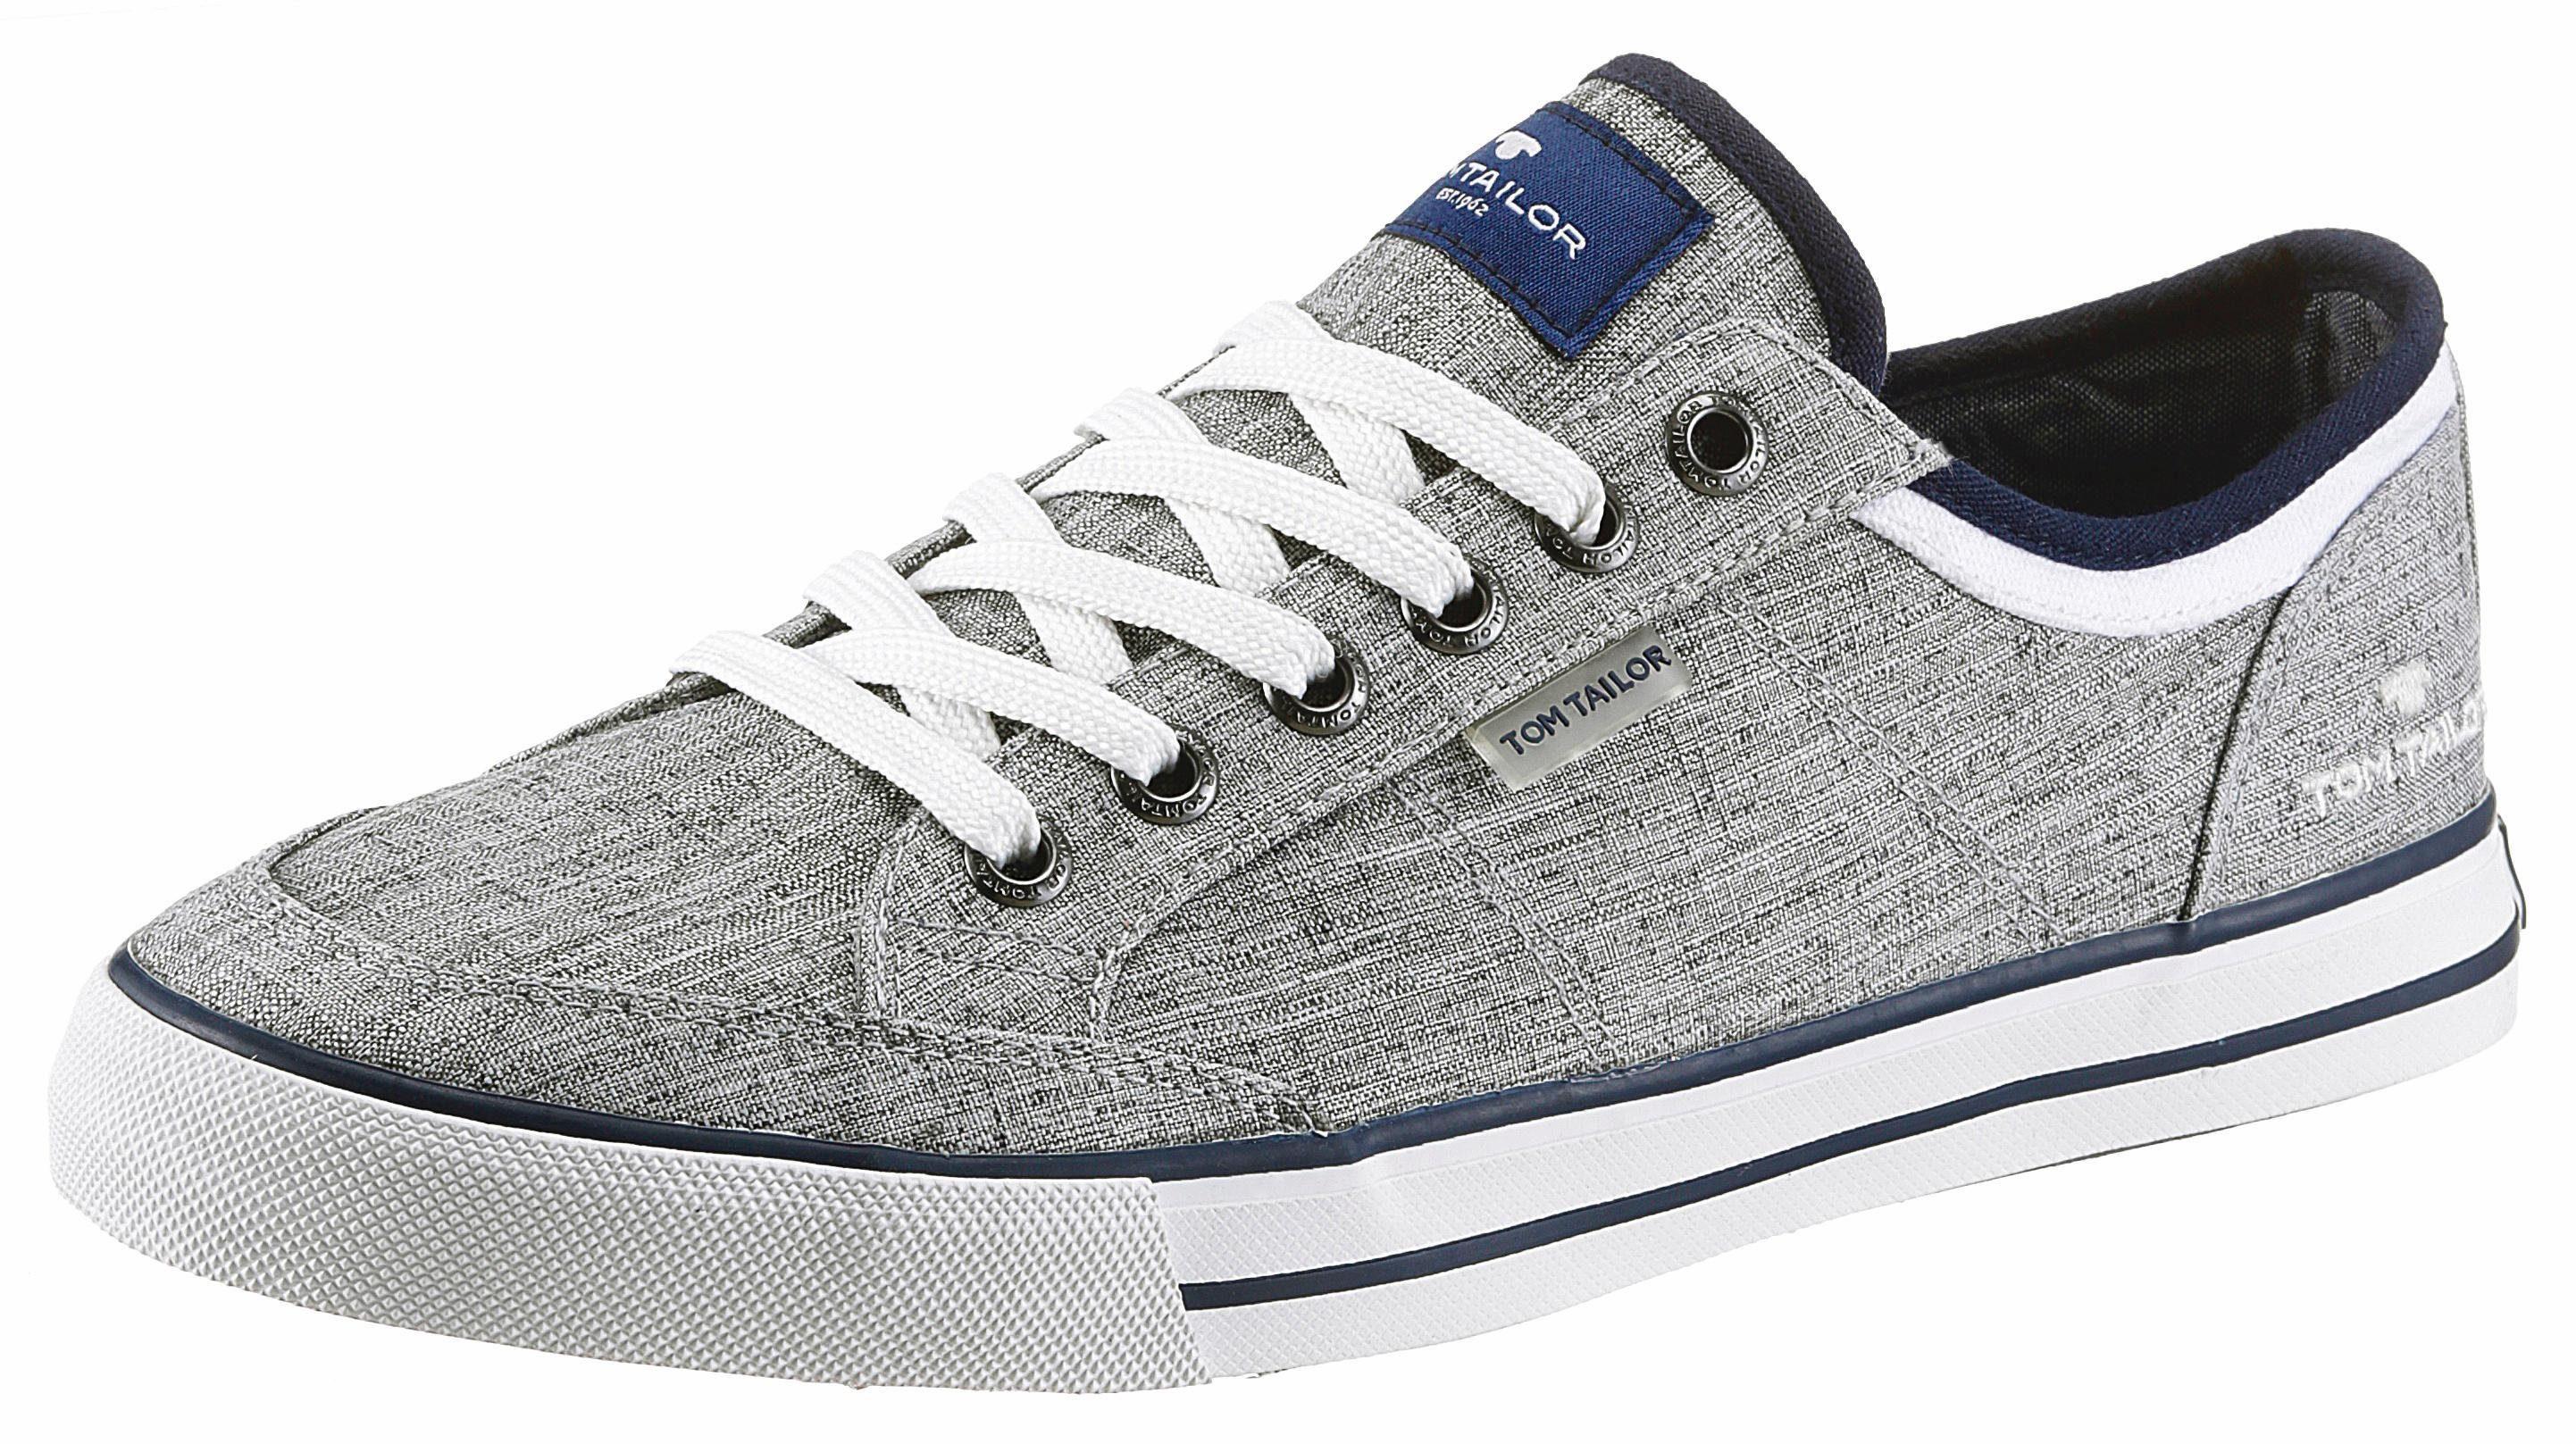 Damen Sneakers NEU Schuhe Halbschuhe Moderne C1-4157 Schnürer Wei Multi 41